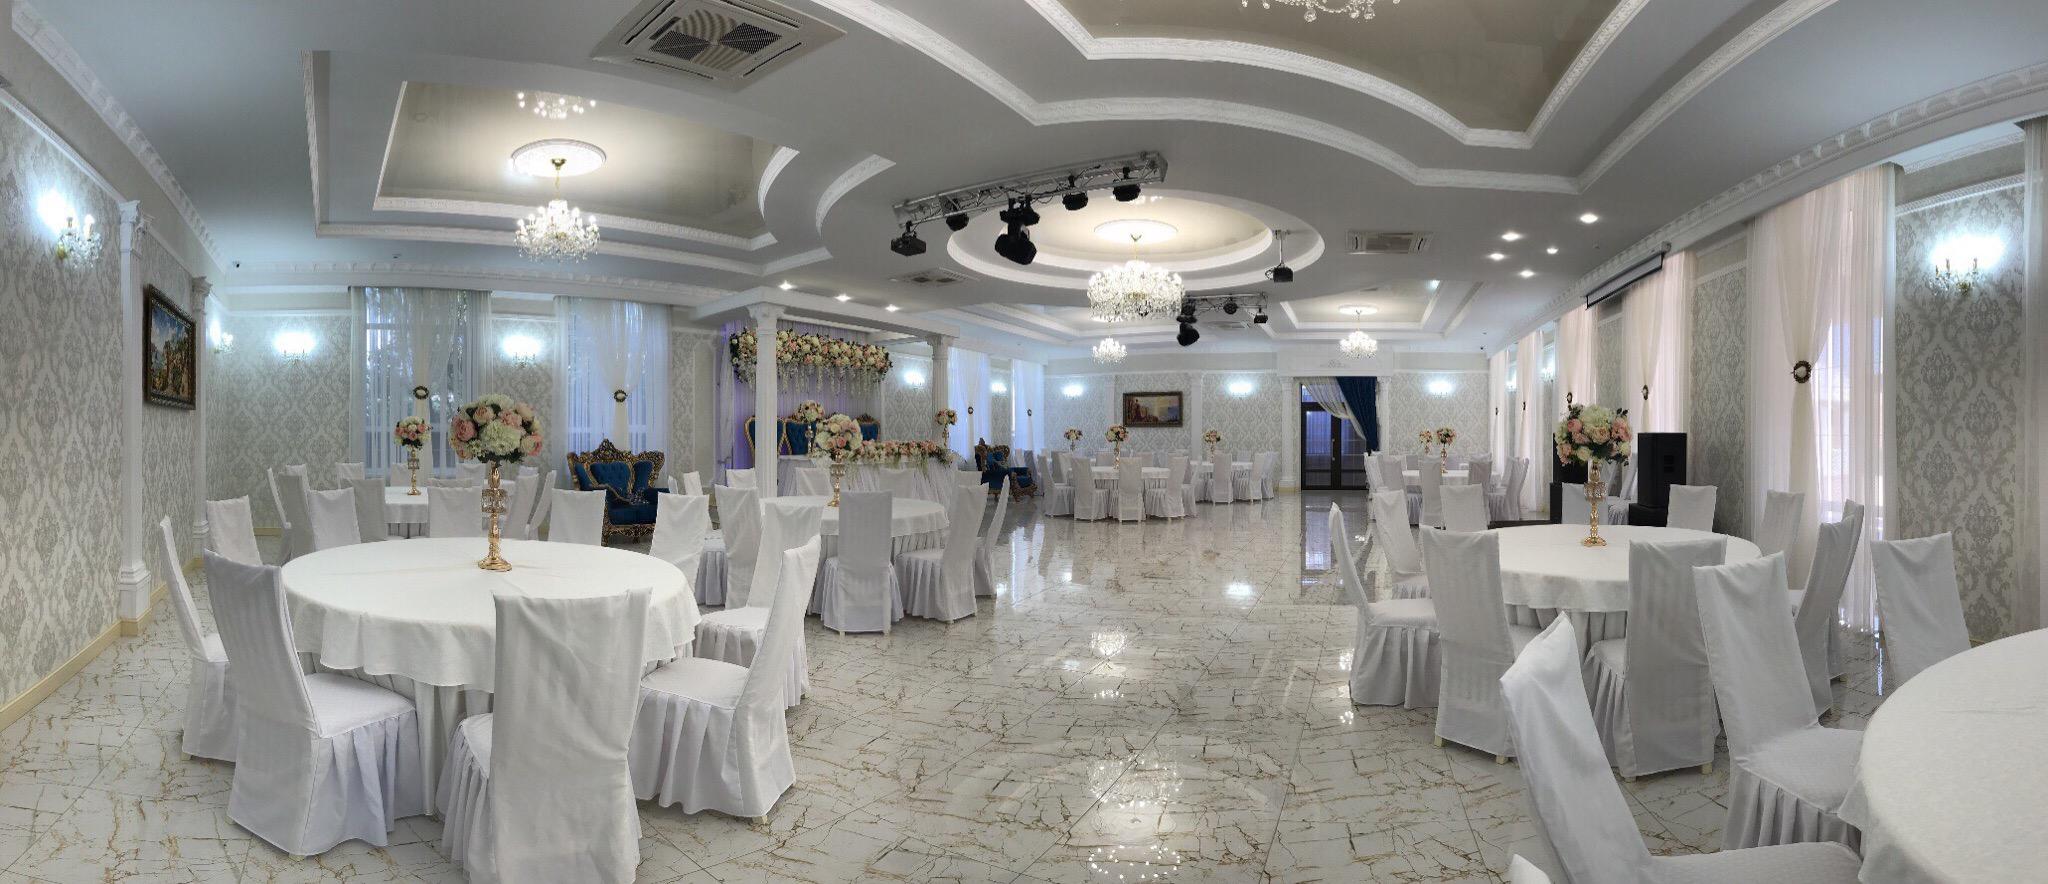 Изумрудный зал